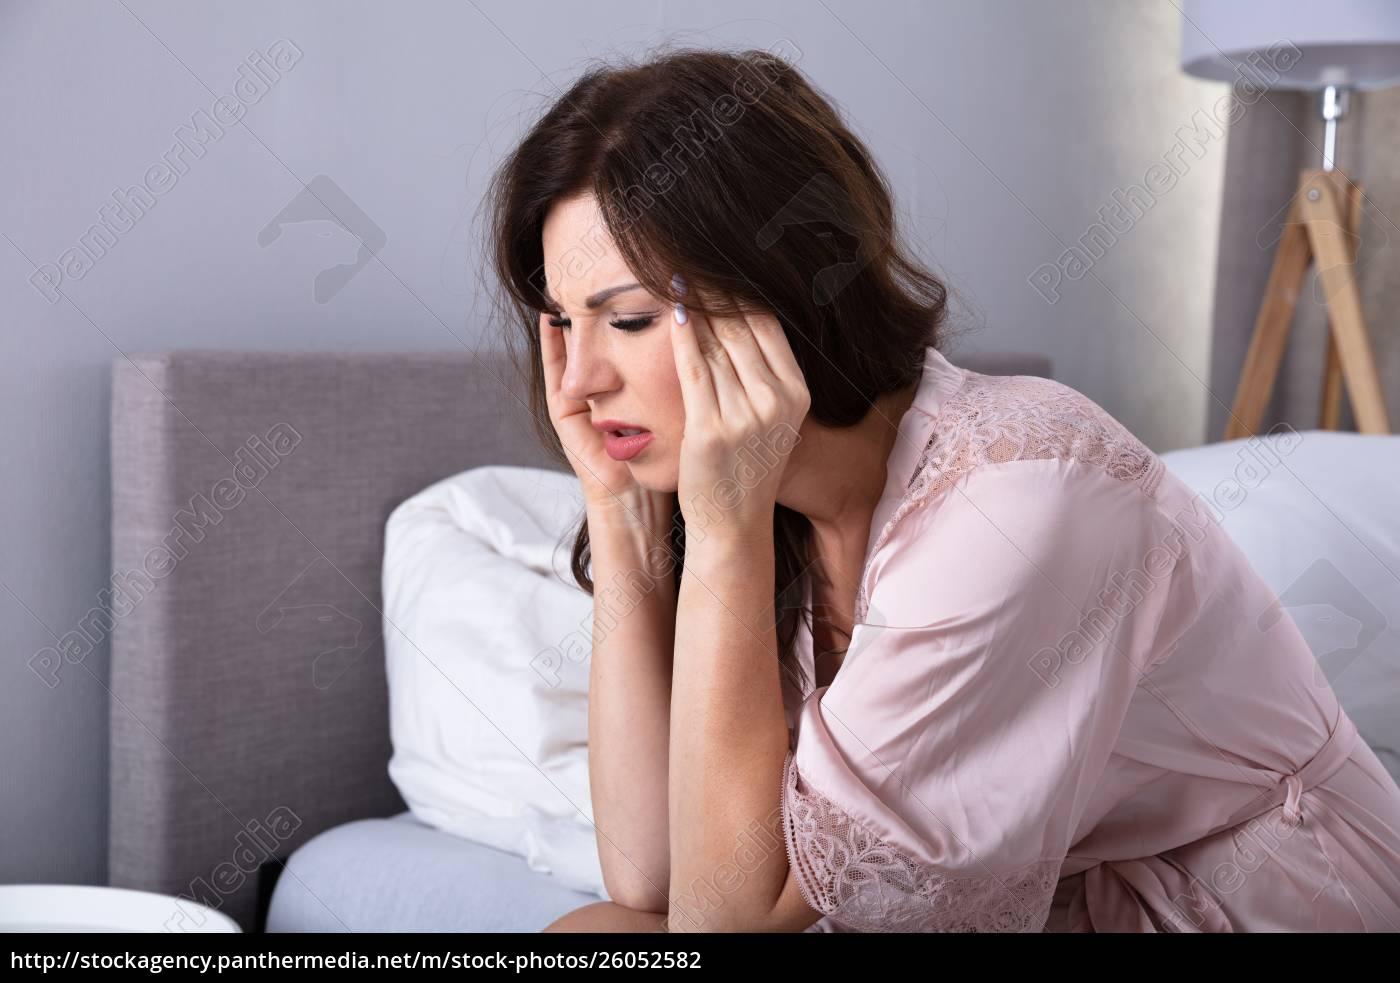 woman, having, headache - 26052582